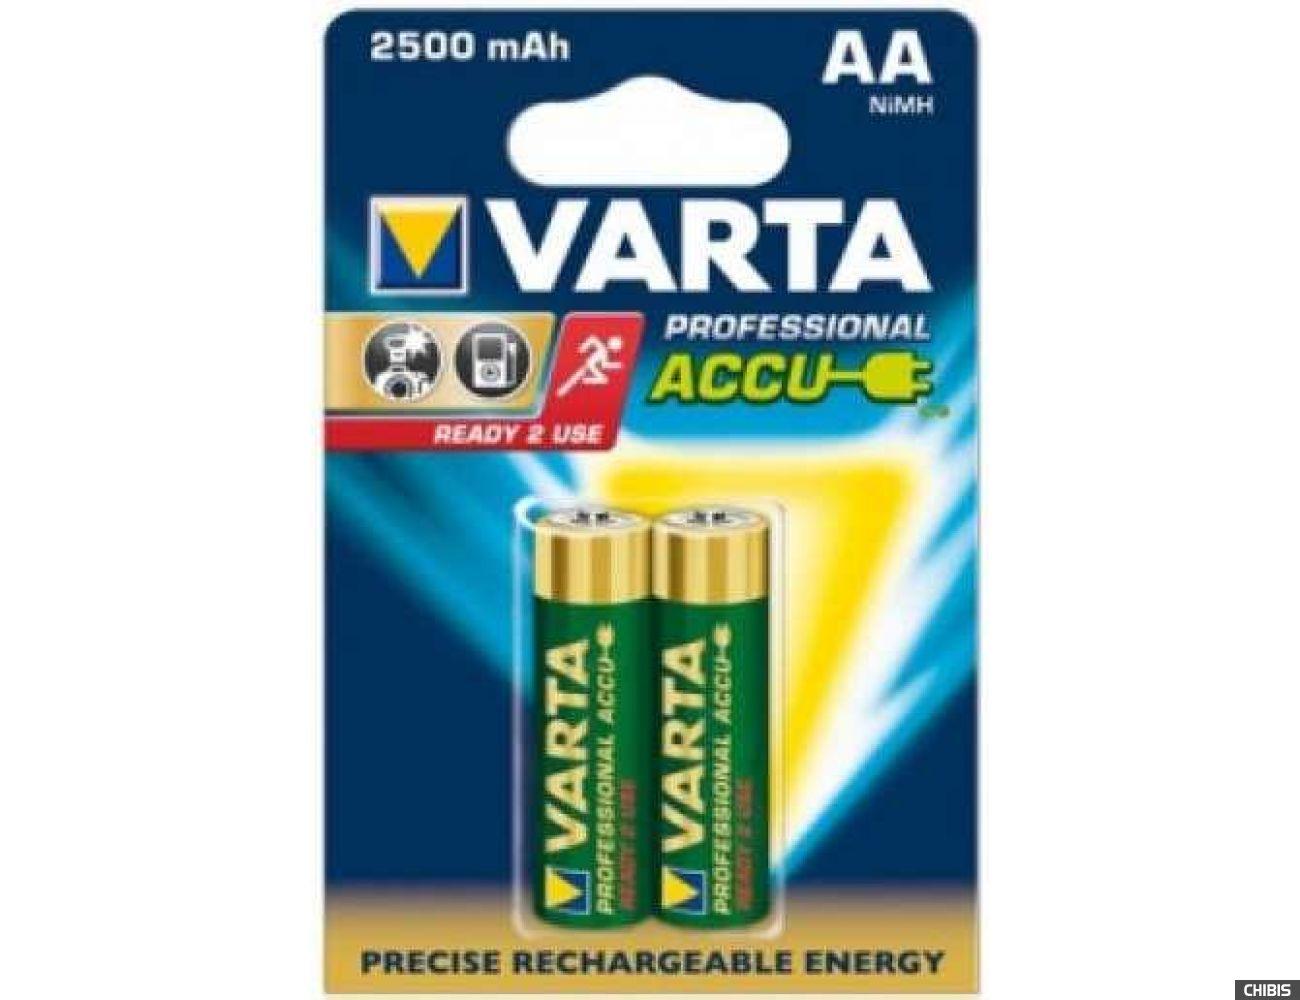 Аккумуляторные батарейки АА Varta 2500 mAh Professional (HR6 Ni-MH) 2/2 шт. 05716101402